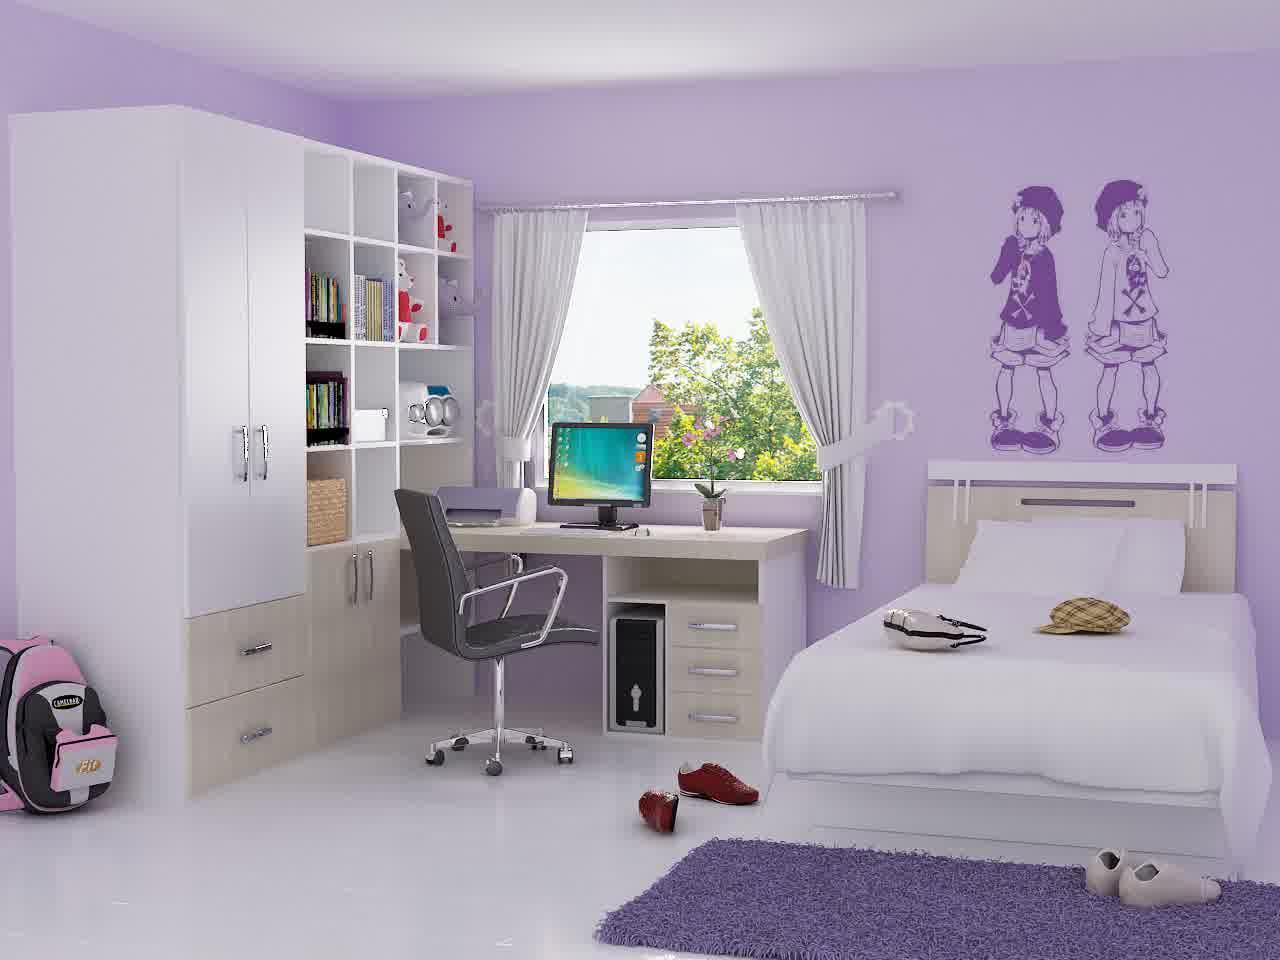 Desain Interior Kamar Tidur Anak